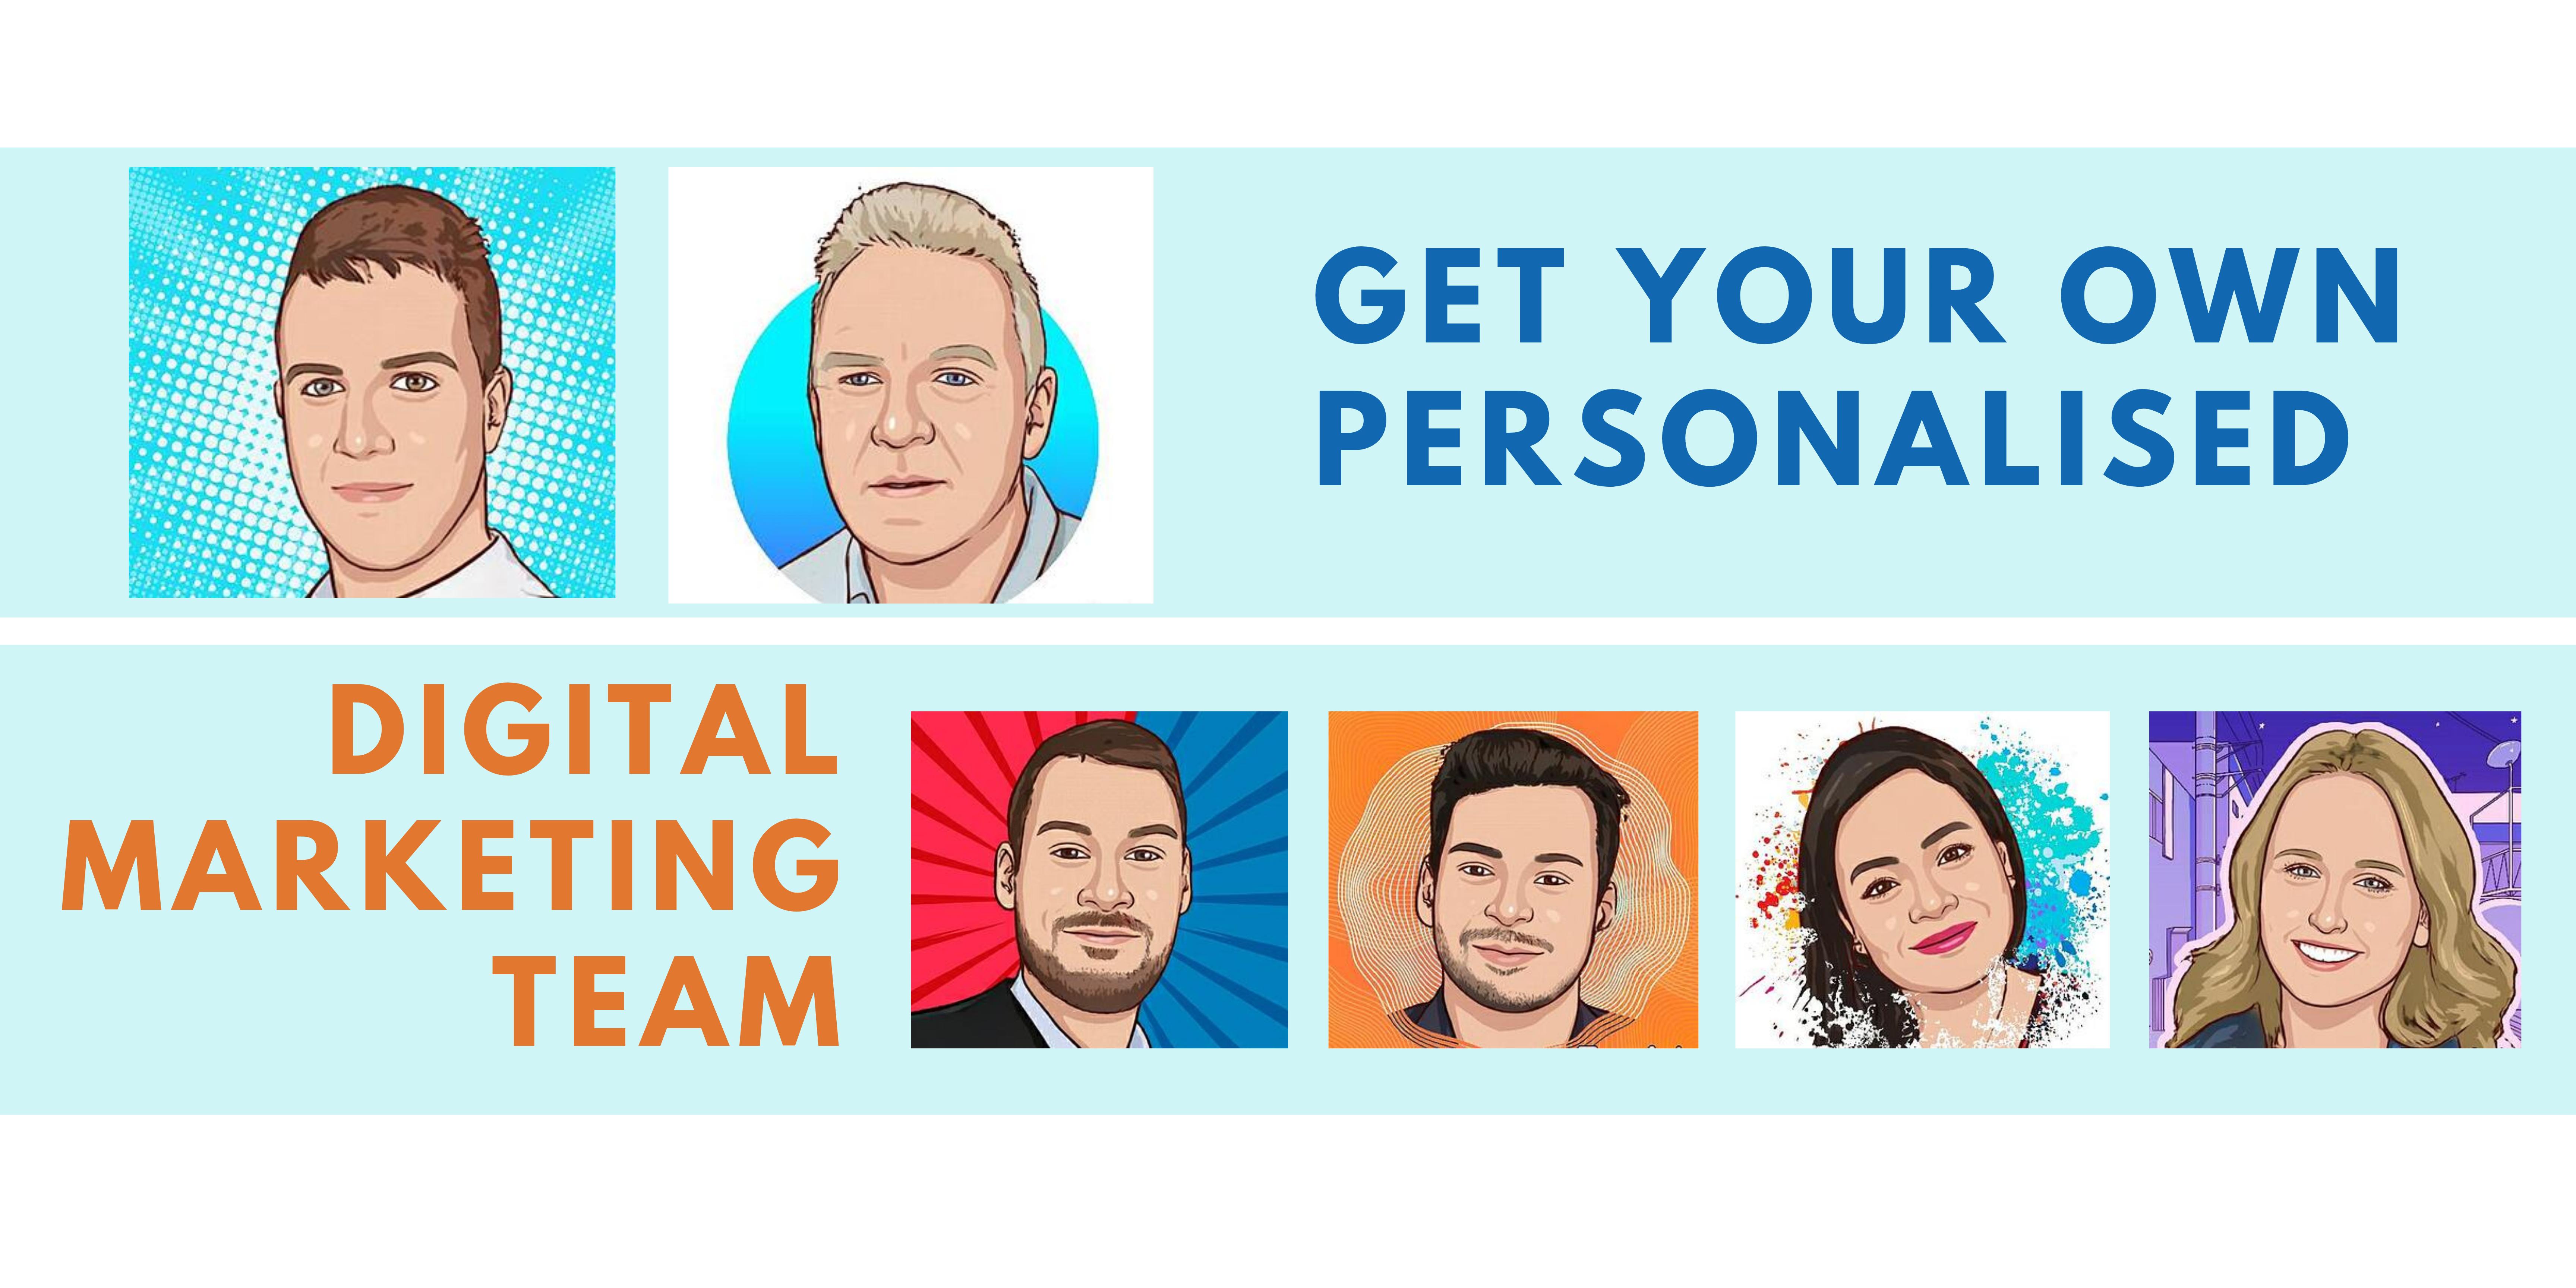 Personalized Digital Marketing Team